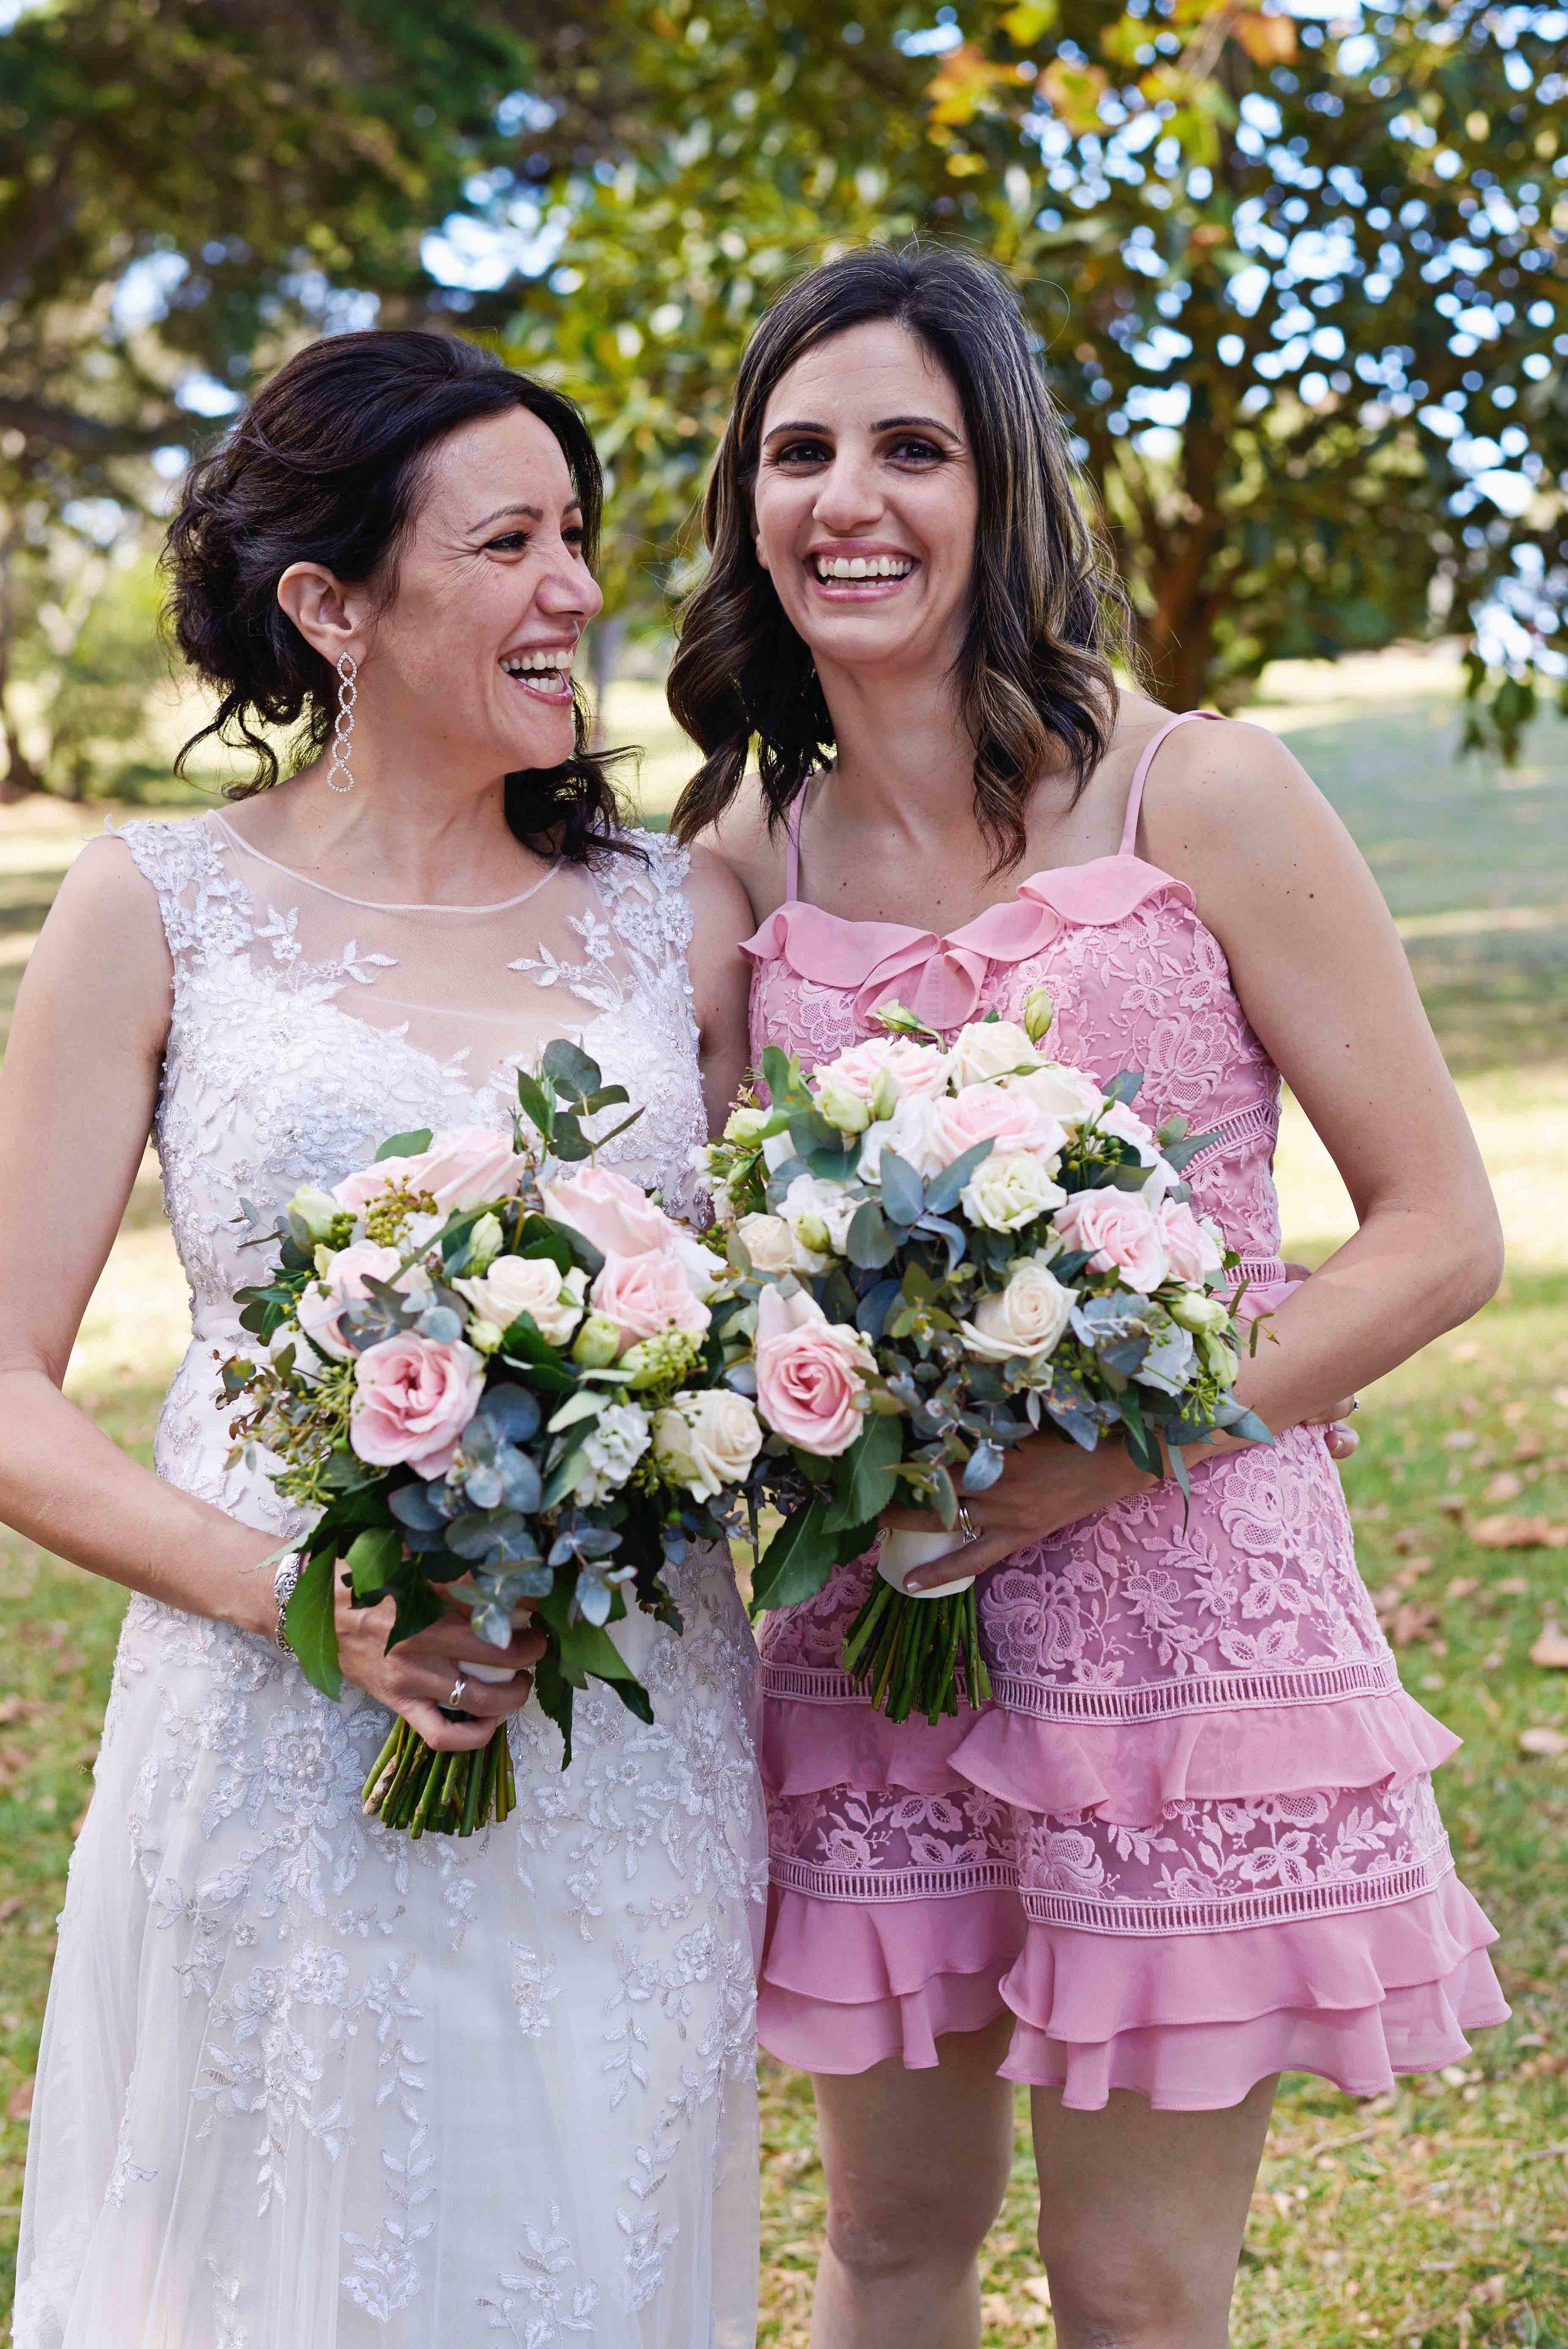 sorrento-wedding-photography-all-smiles-marissa-jade-photography-133.jpg